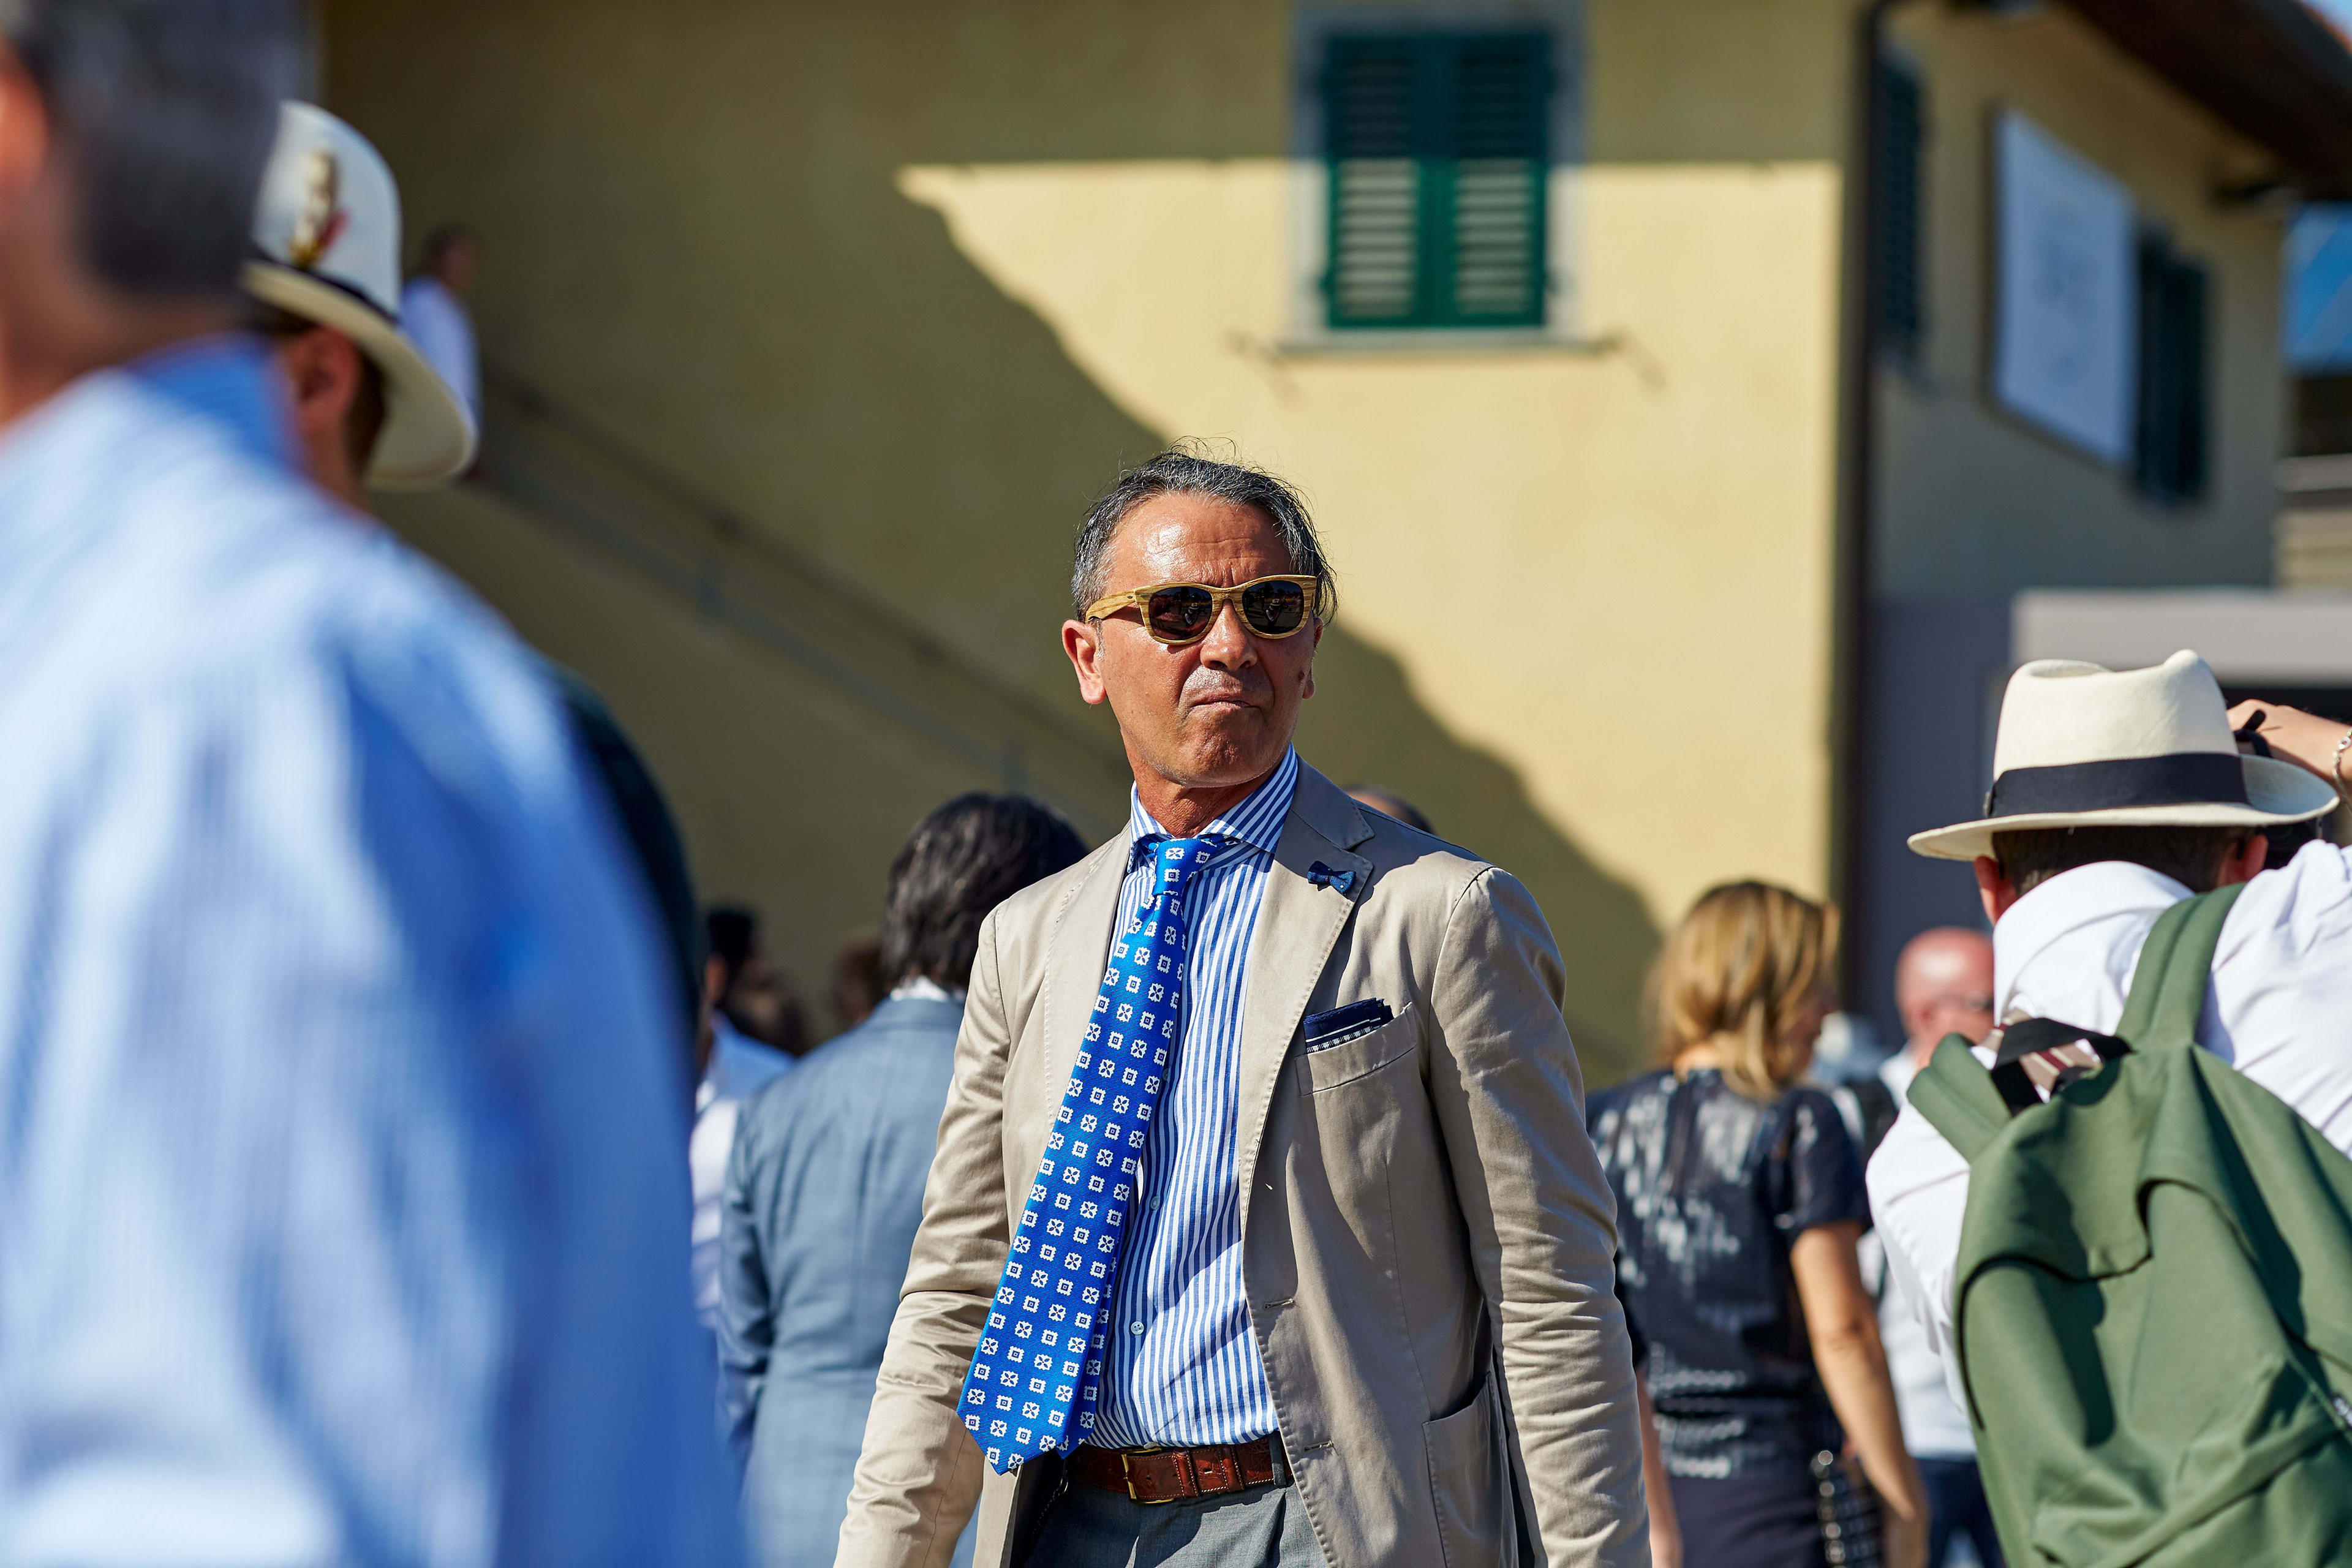 Richard Moran Pitti Fashion Italy Lifestyle 013